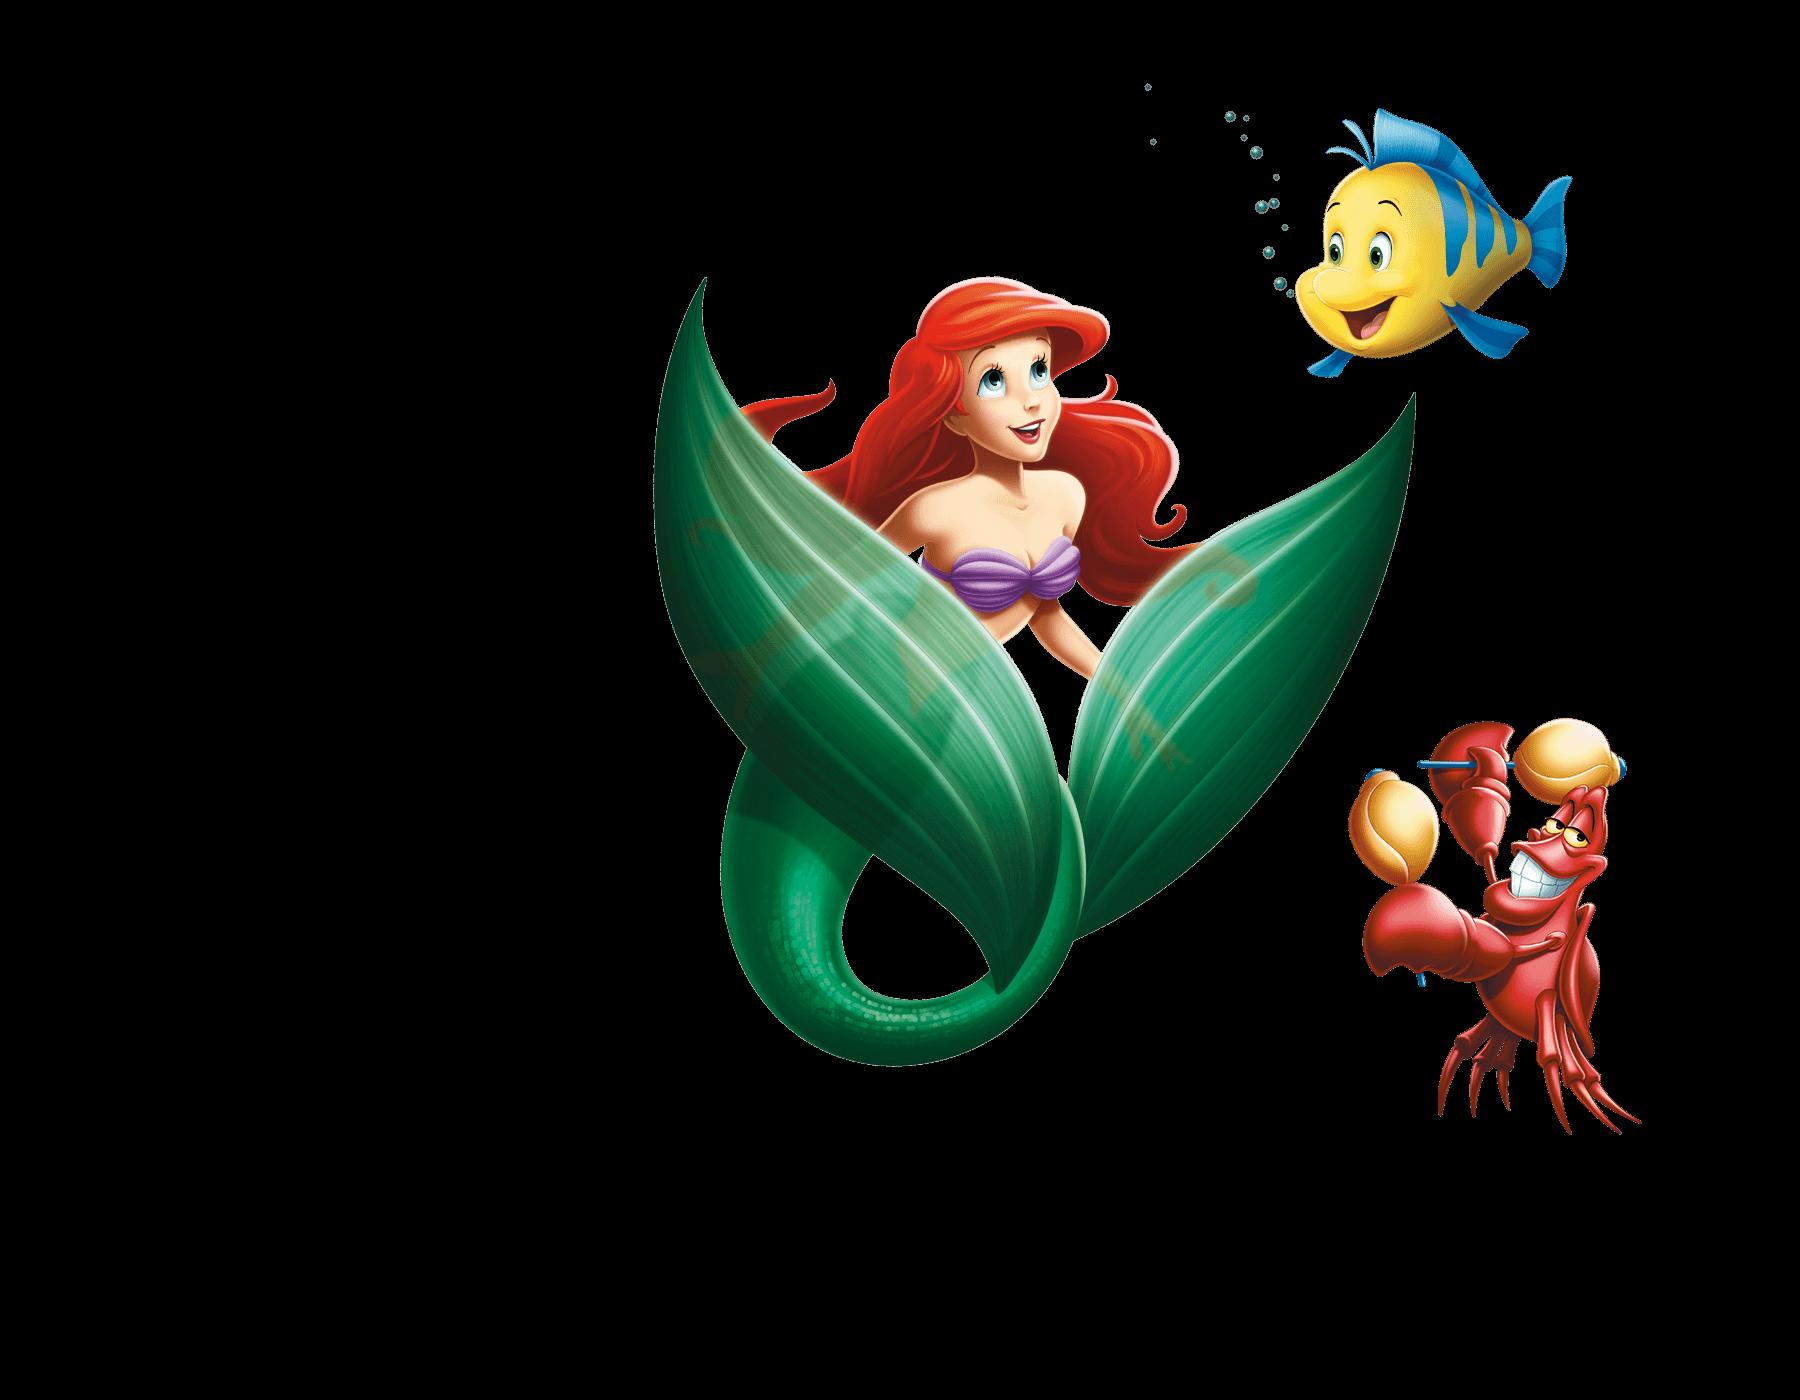 Free The Little Mermaid